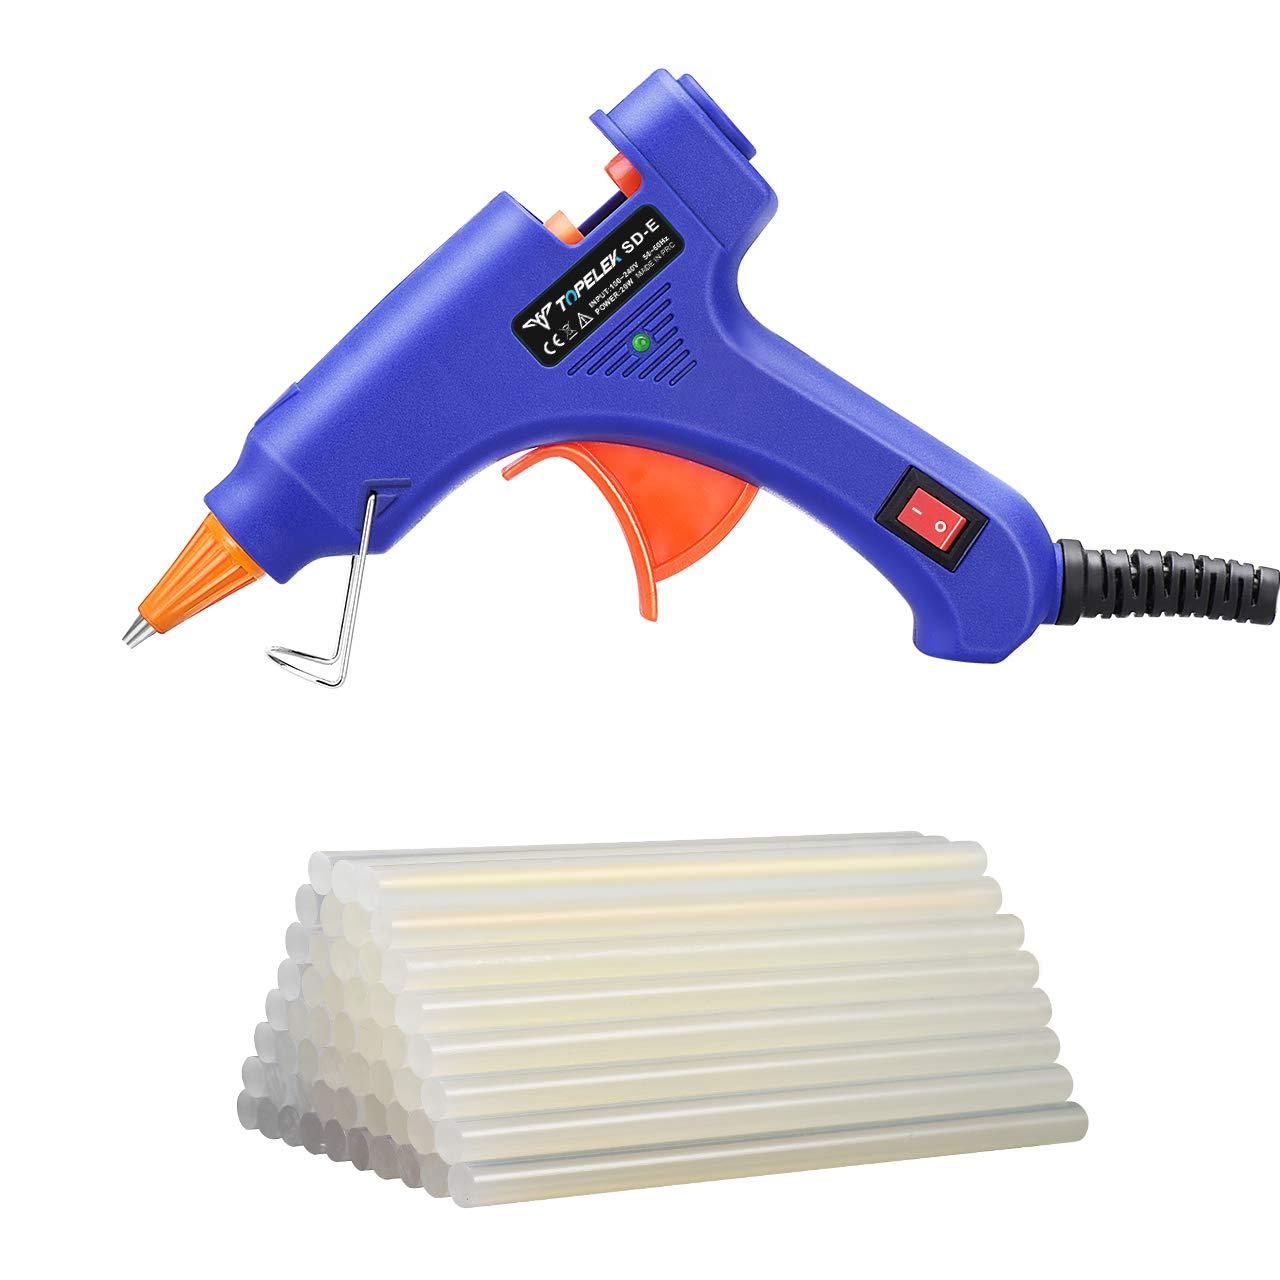 Hot Glue Gun, TopElek Mini Glue Gun Kit with 50pcs Glue Sticks, High Temperature Melting Glue Gun for DIY Small Projects, Arts and Crafts, Home Quick Repairs,Artistic Creation(20 Watts, Blue)